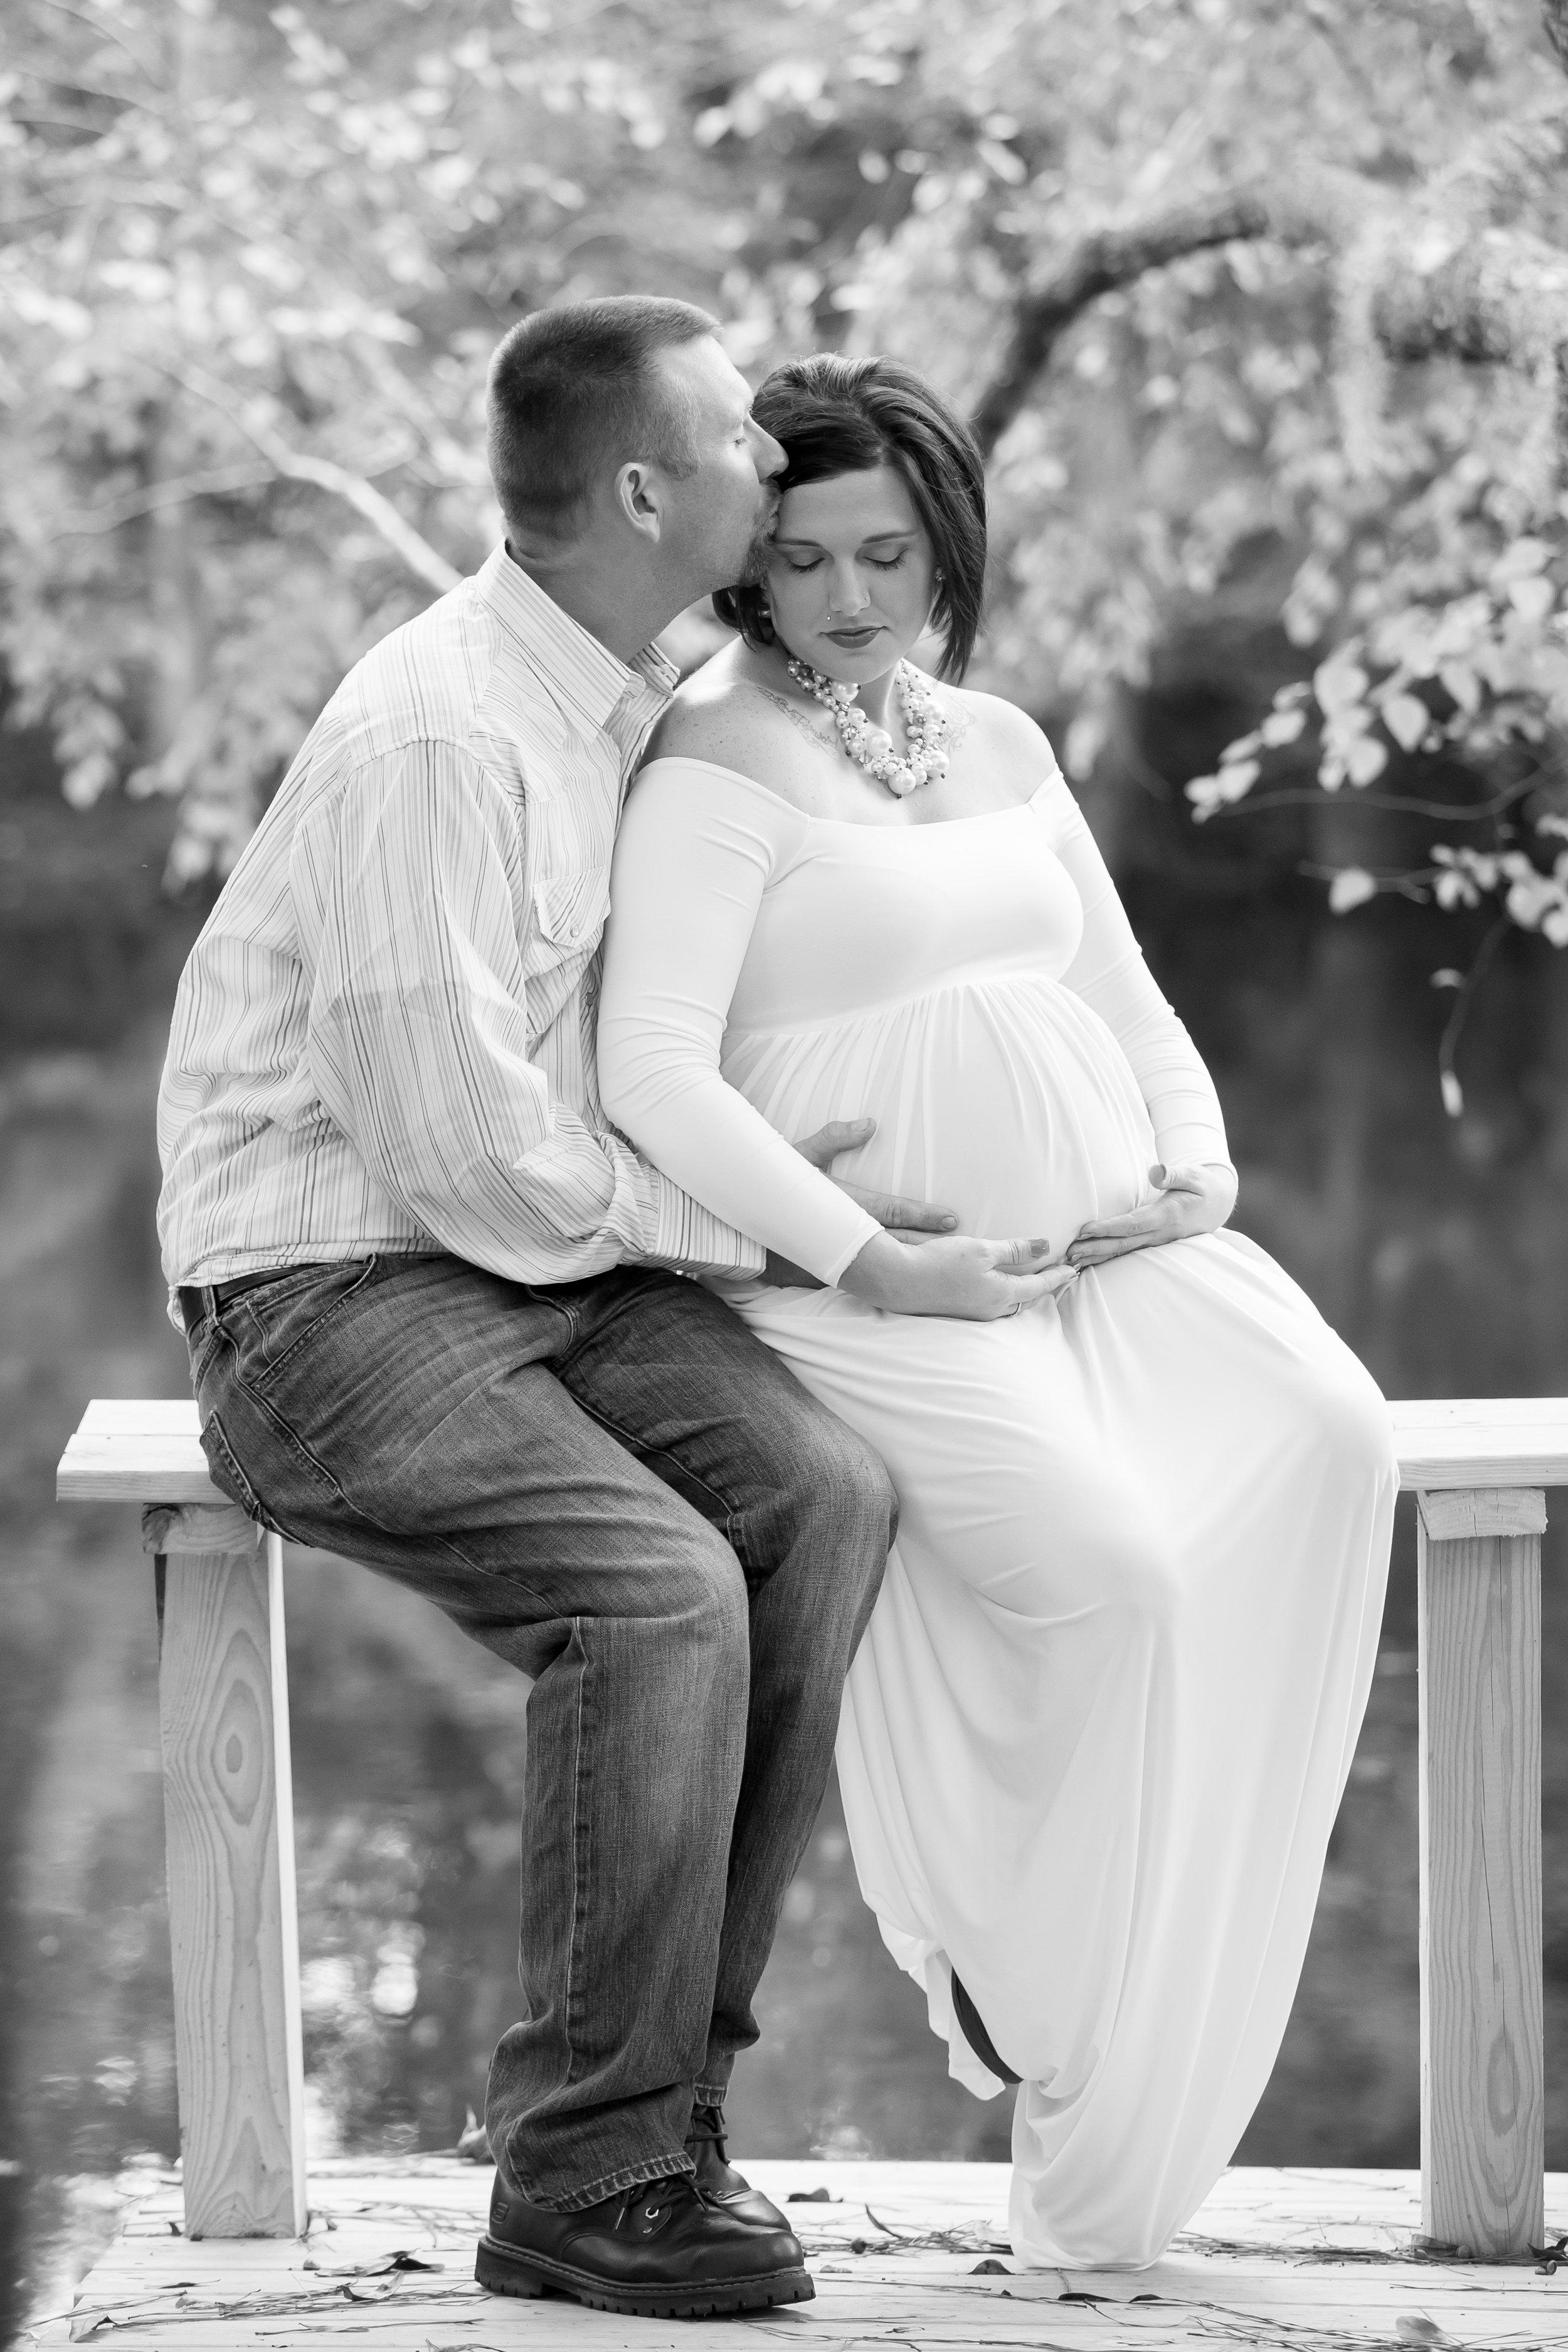 Wilmington Maternity Photography